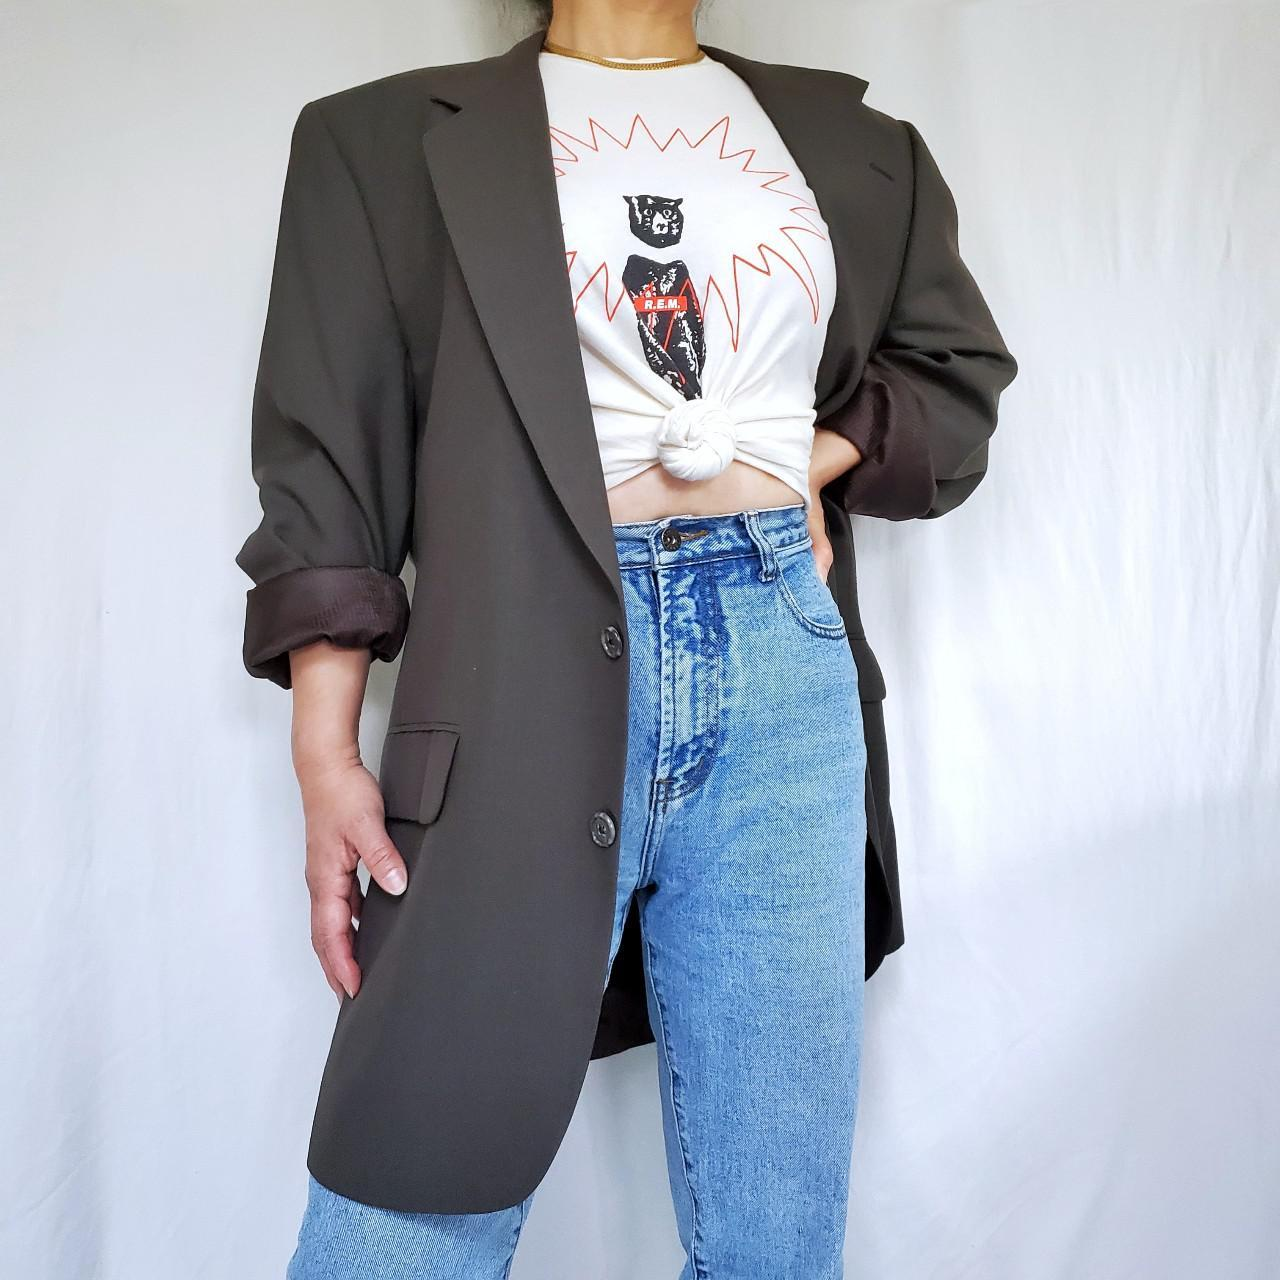 Product Image 1 - Vintage Halston oversized blazer  ❗OUT OF